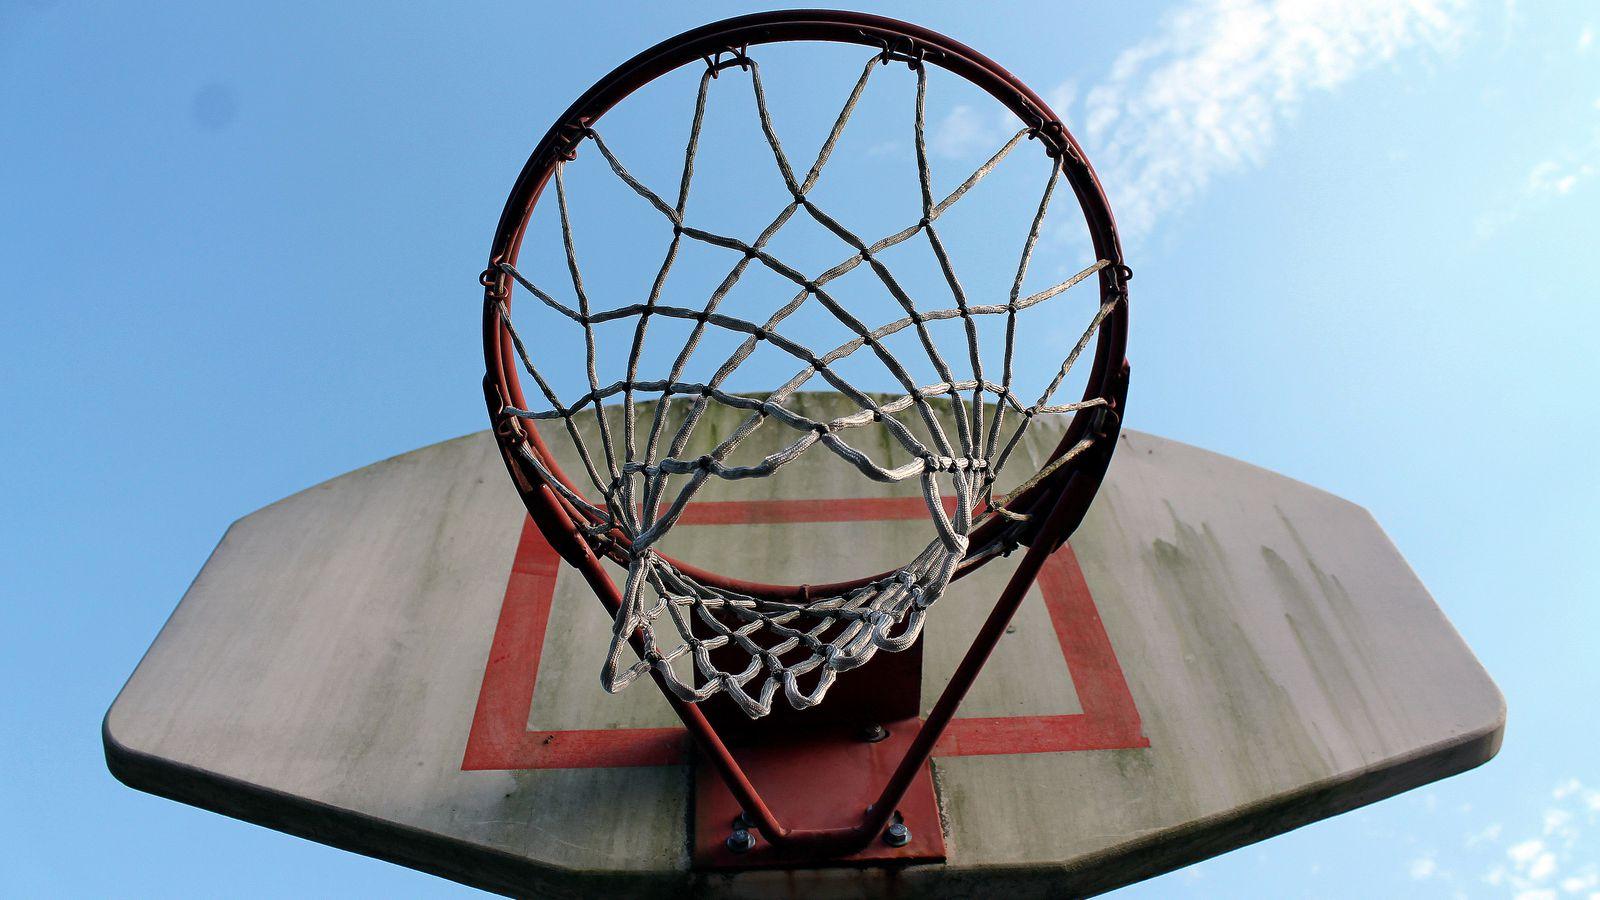 Basketball_20ring.0